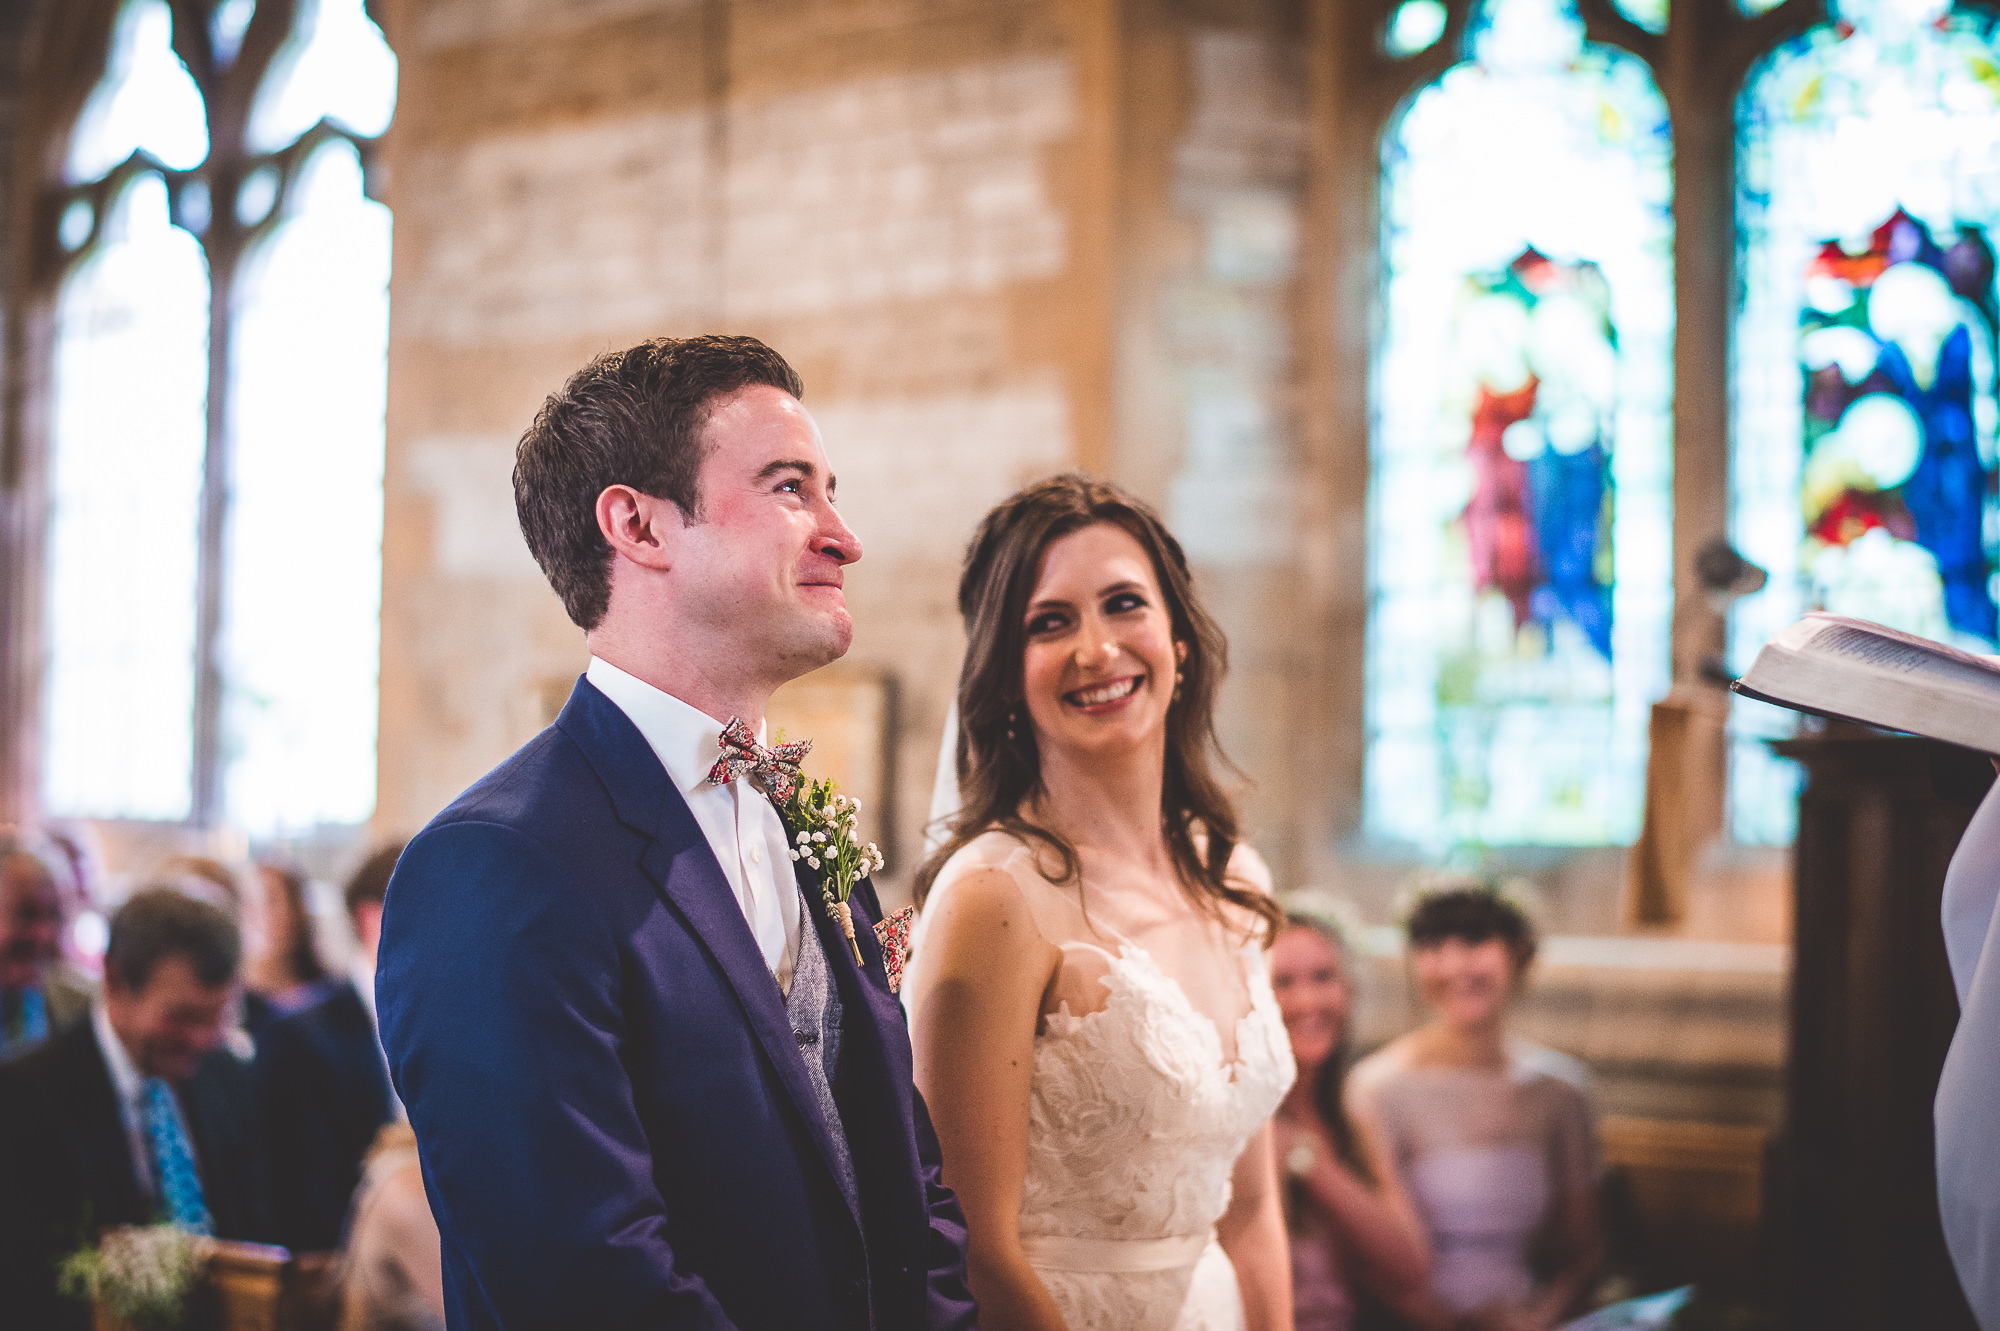 Veils & Bales Wedding Photography | Charlie & Steve SCSS 075